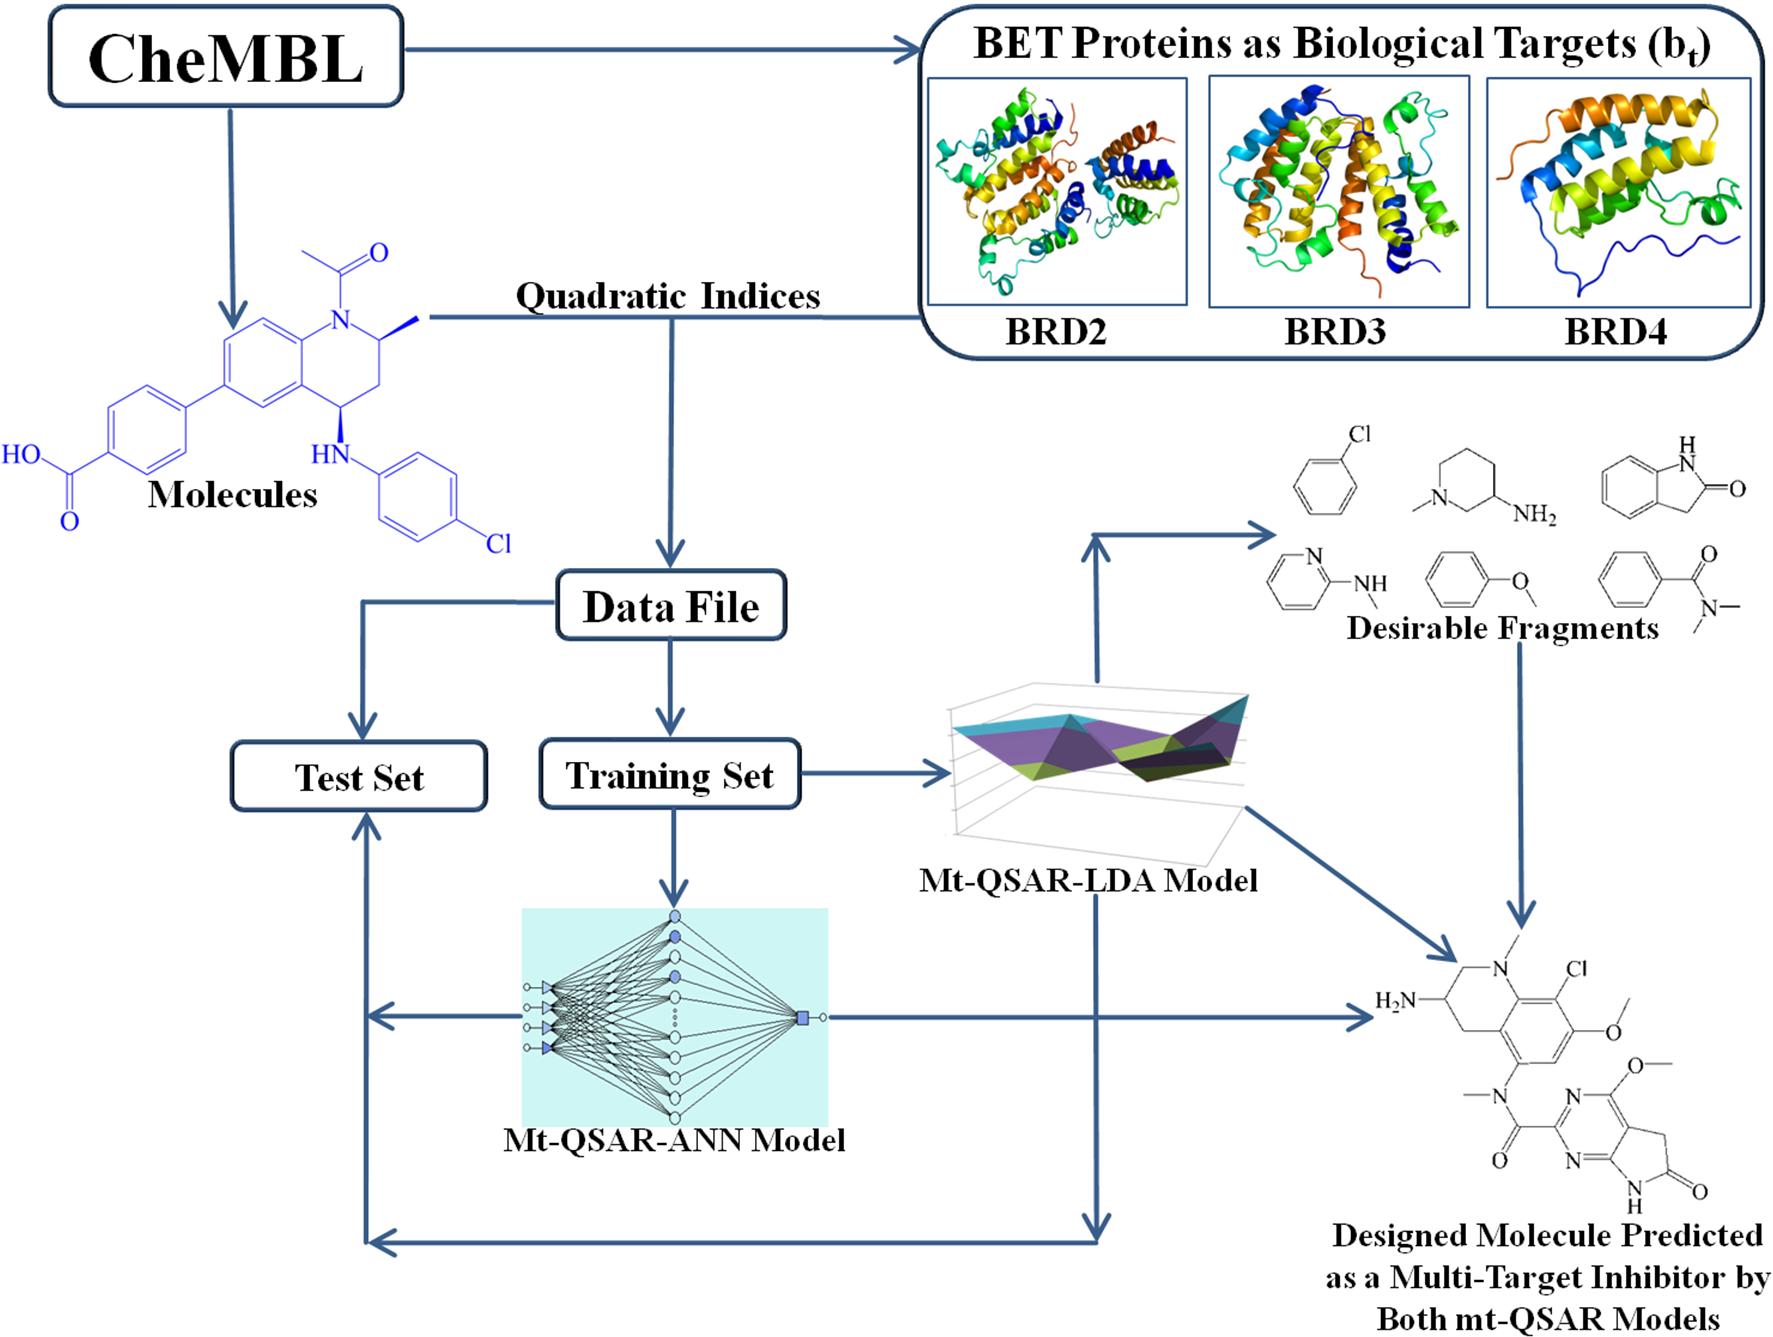 BET bromodomain inhibitors: fragment-based in silico design using